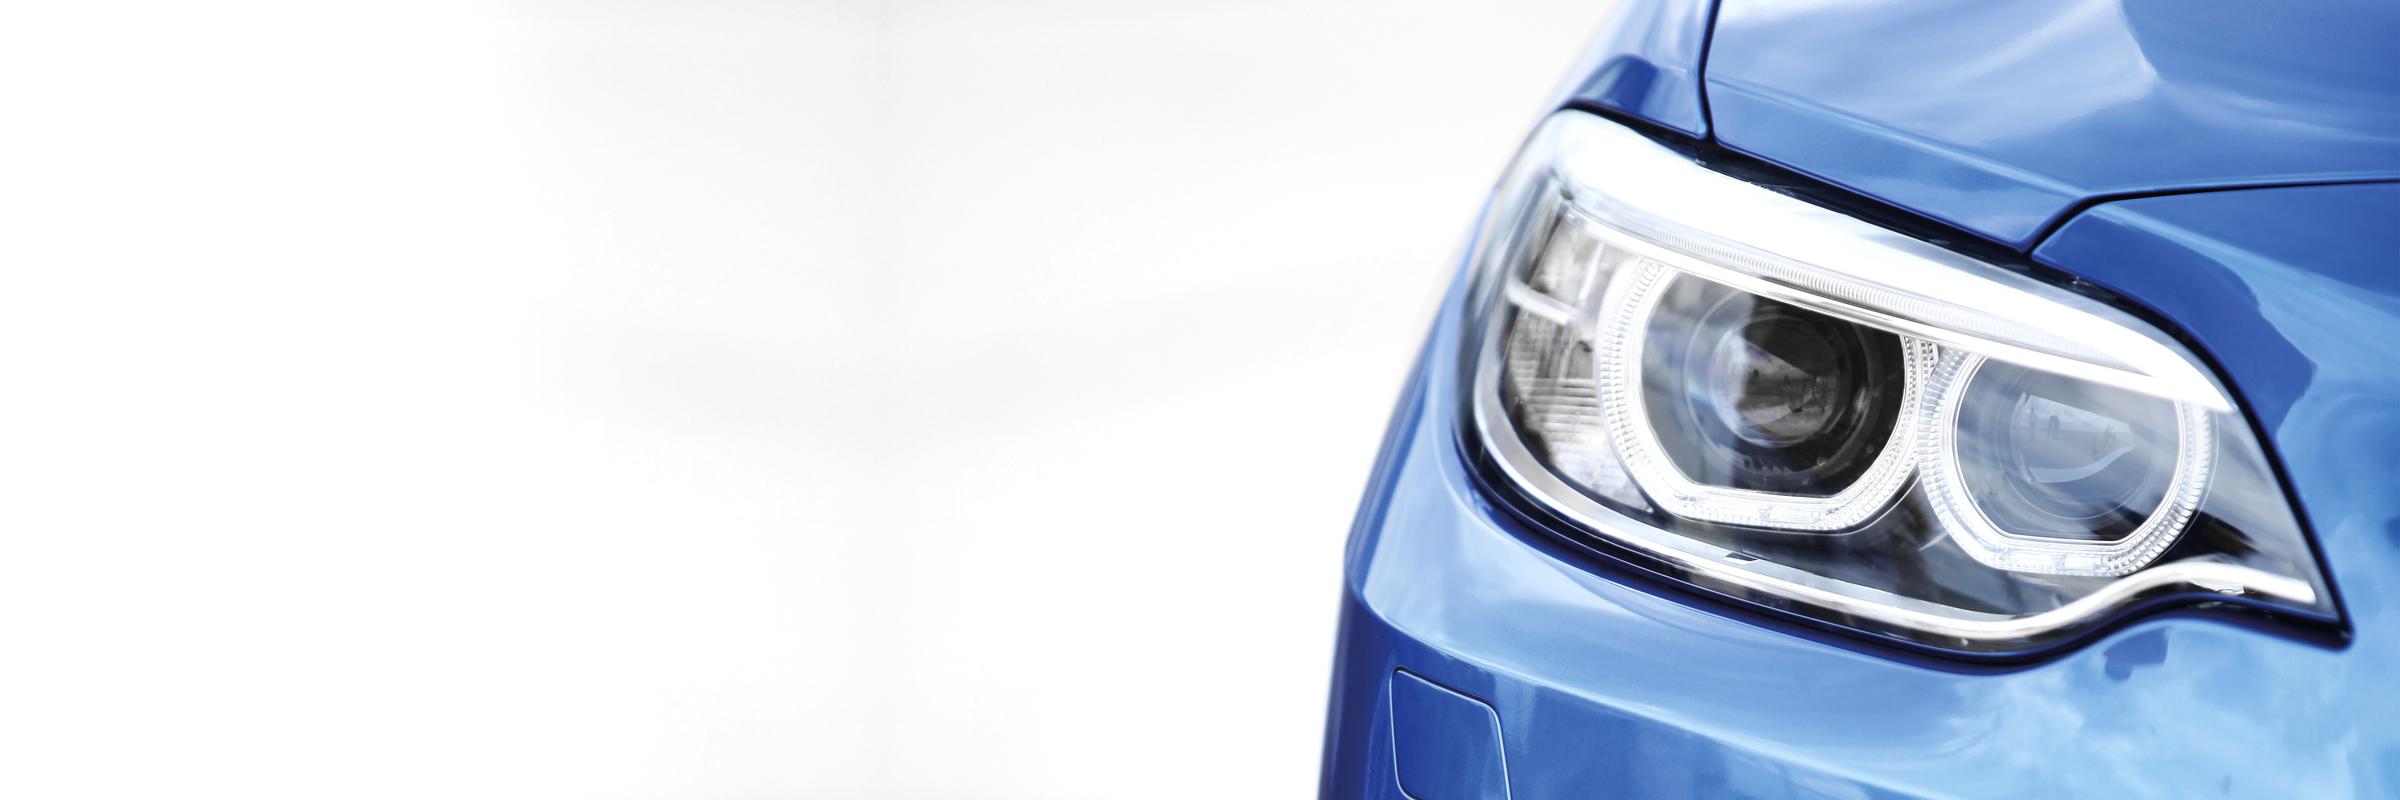 Automobil und eMobilität - LED-Beleuchtung